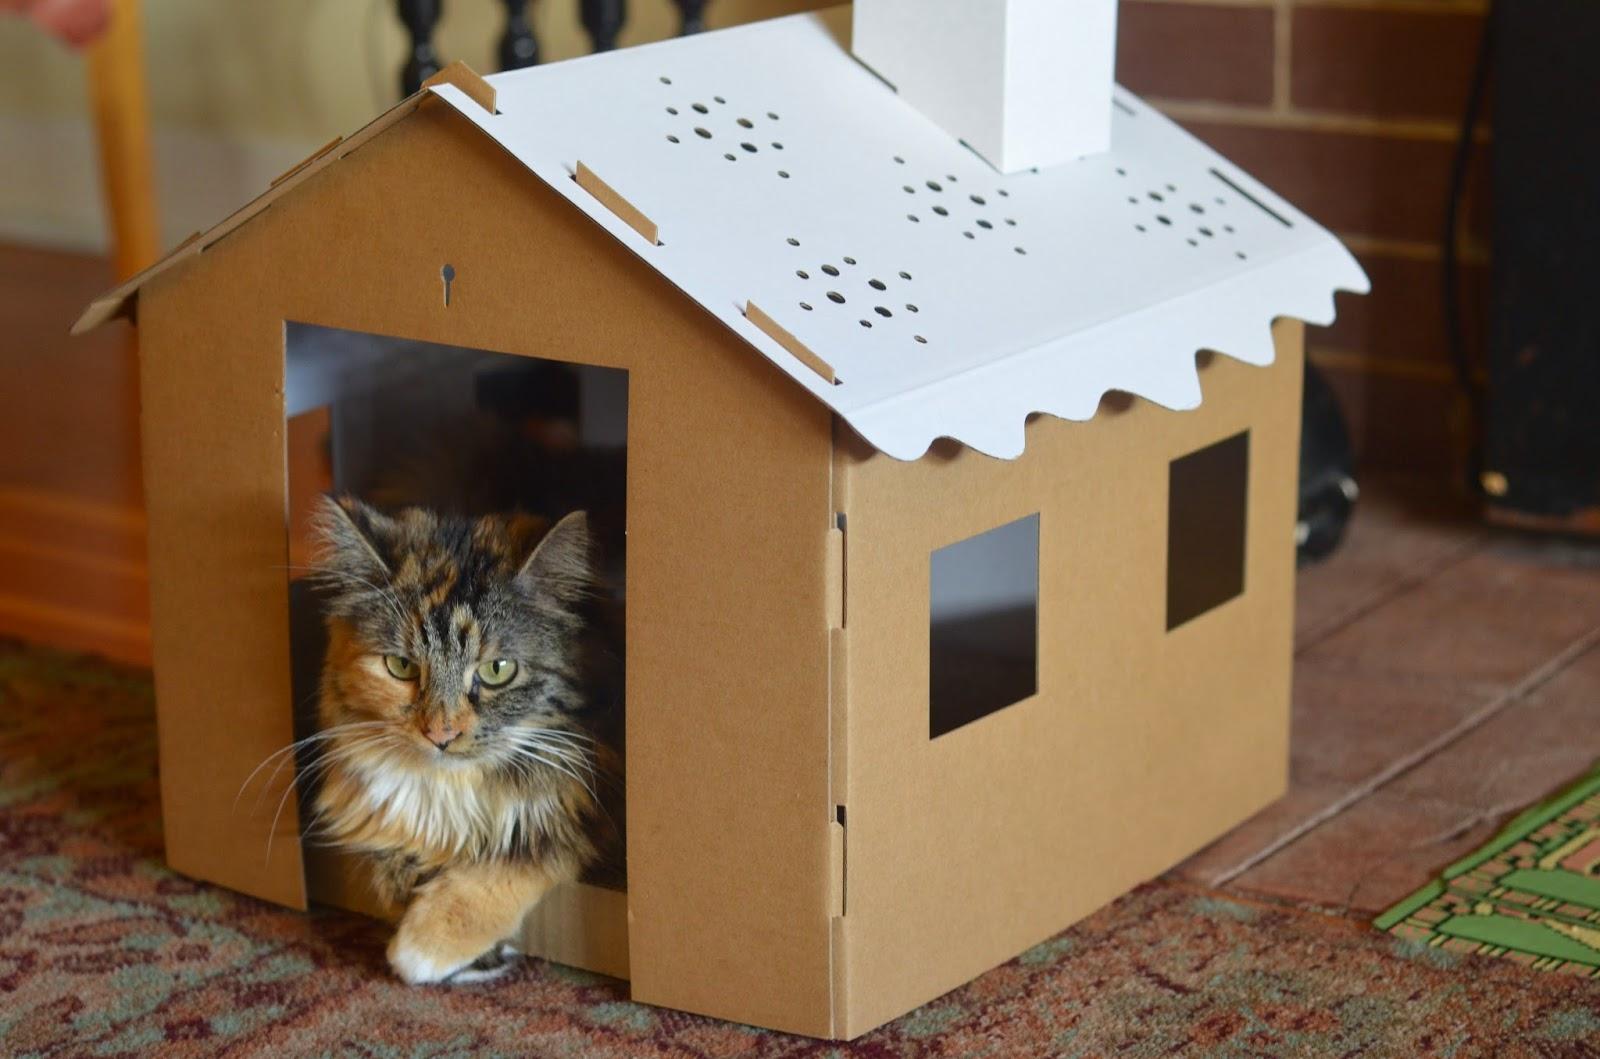 M s y m s manualidades casas de cart n para mascotas - Casas para gatos baratas ...